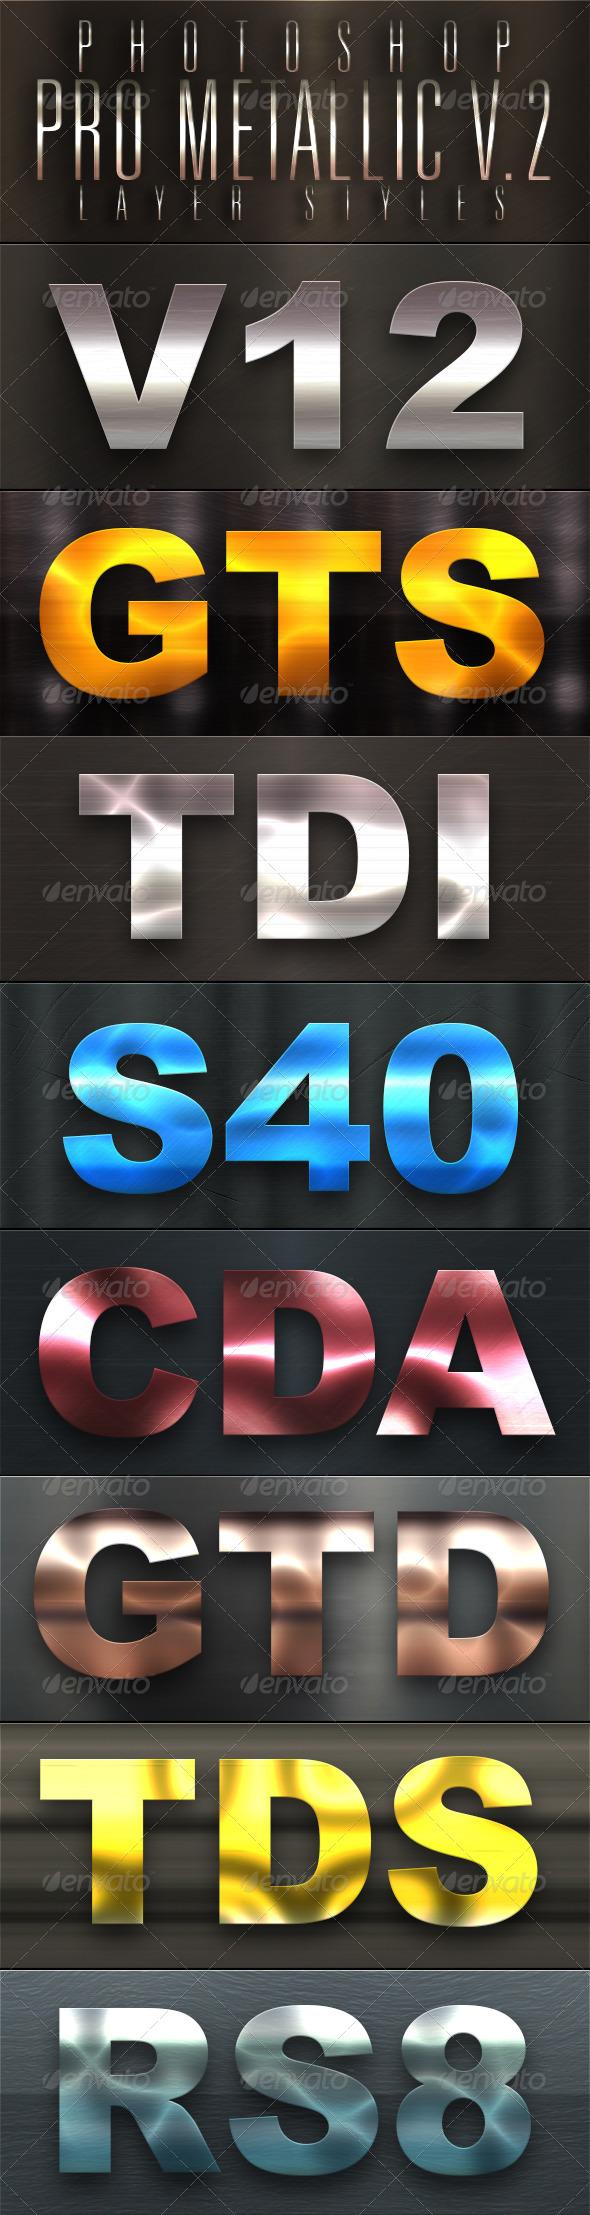 GraphicRiver Pro Metallic Styles V 2 5015572